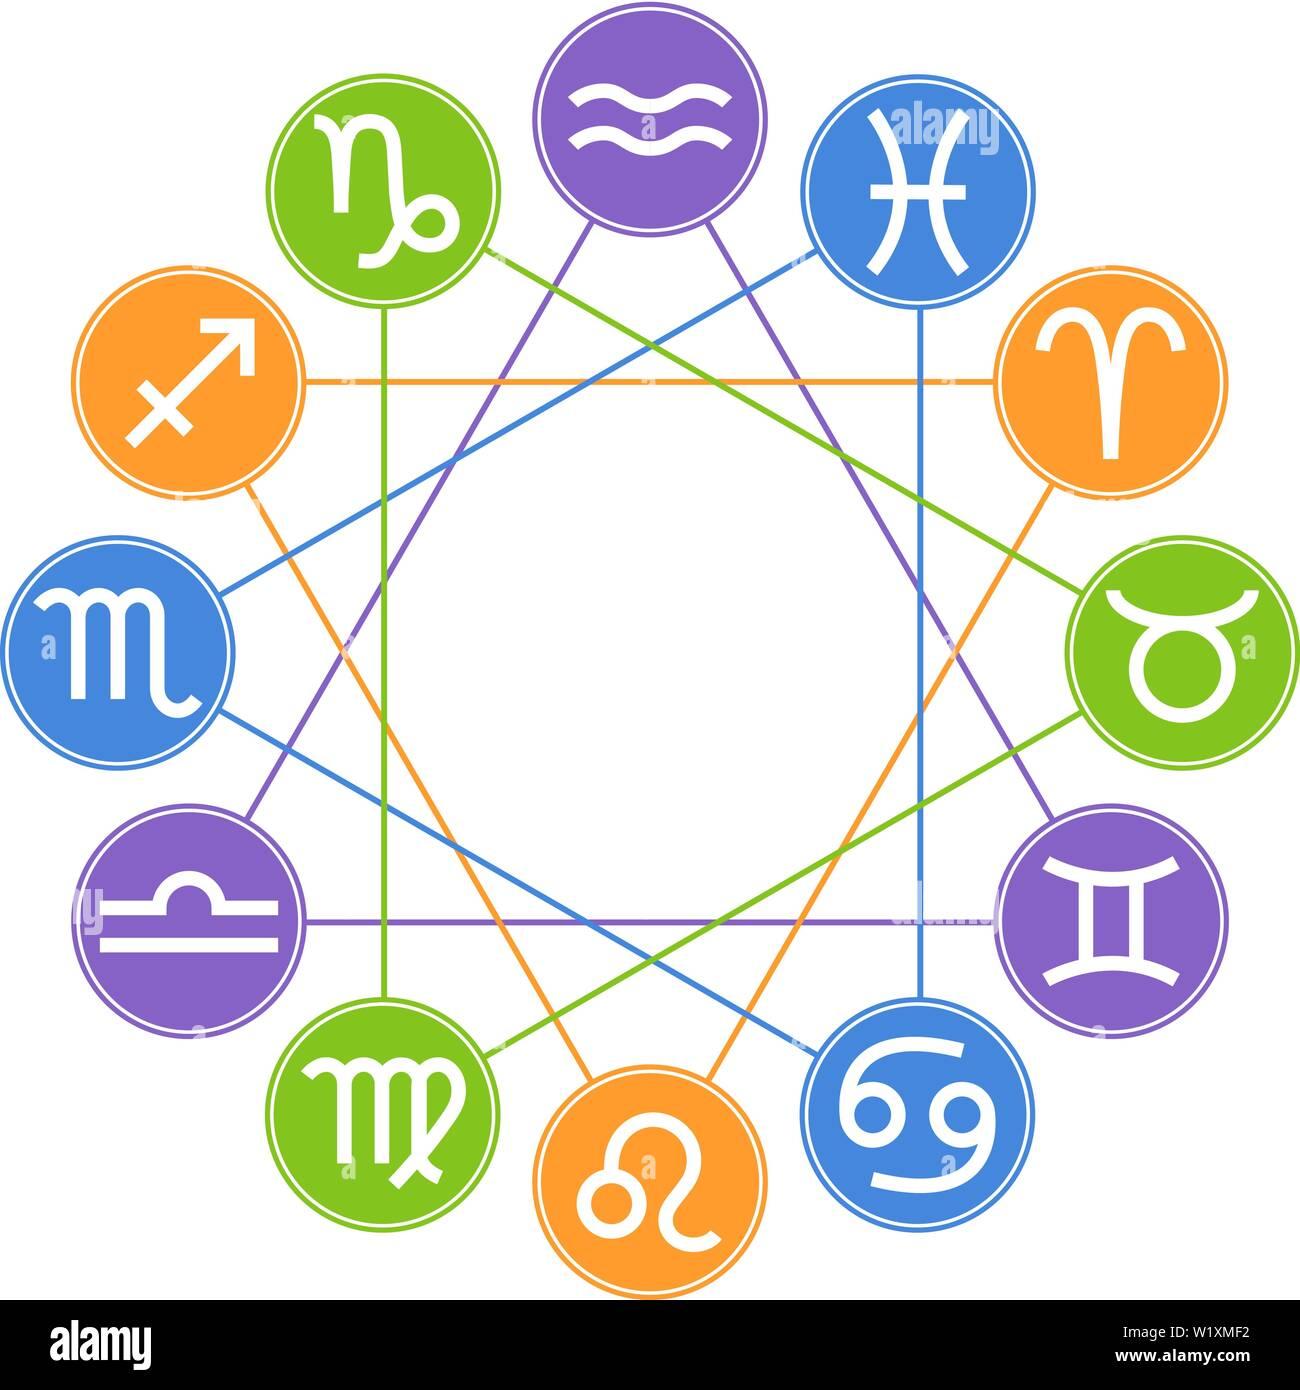 Circle Zodiac Signs  Zodiac Element  Horoscope signs: Leo